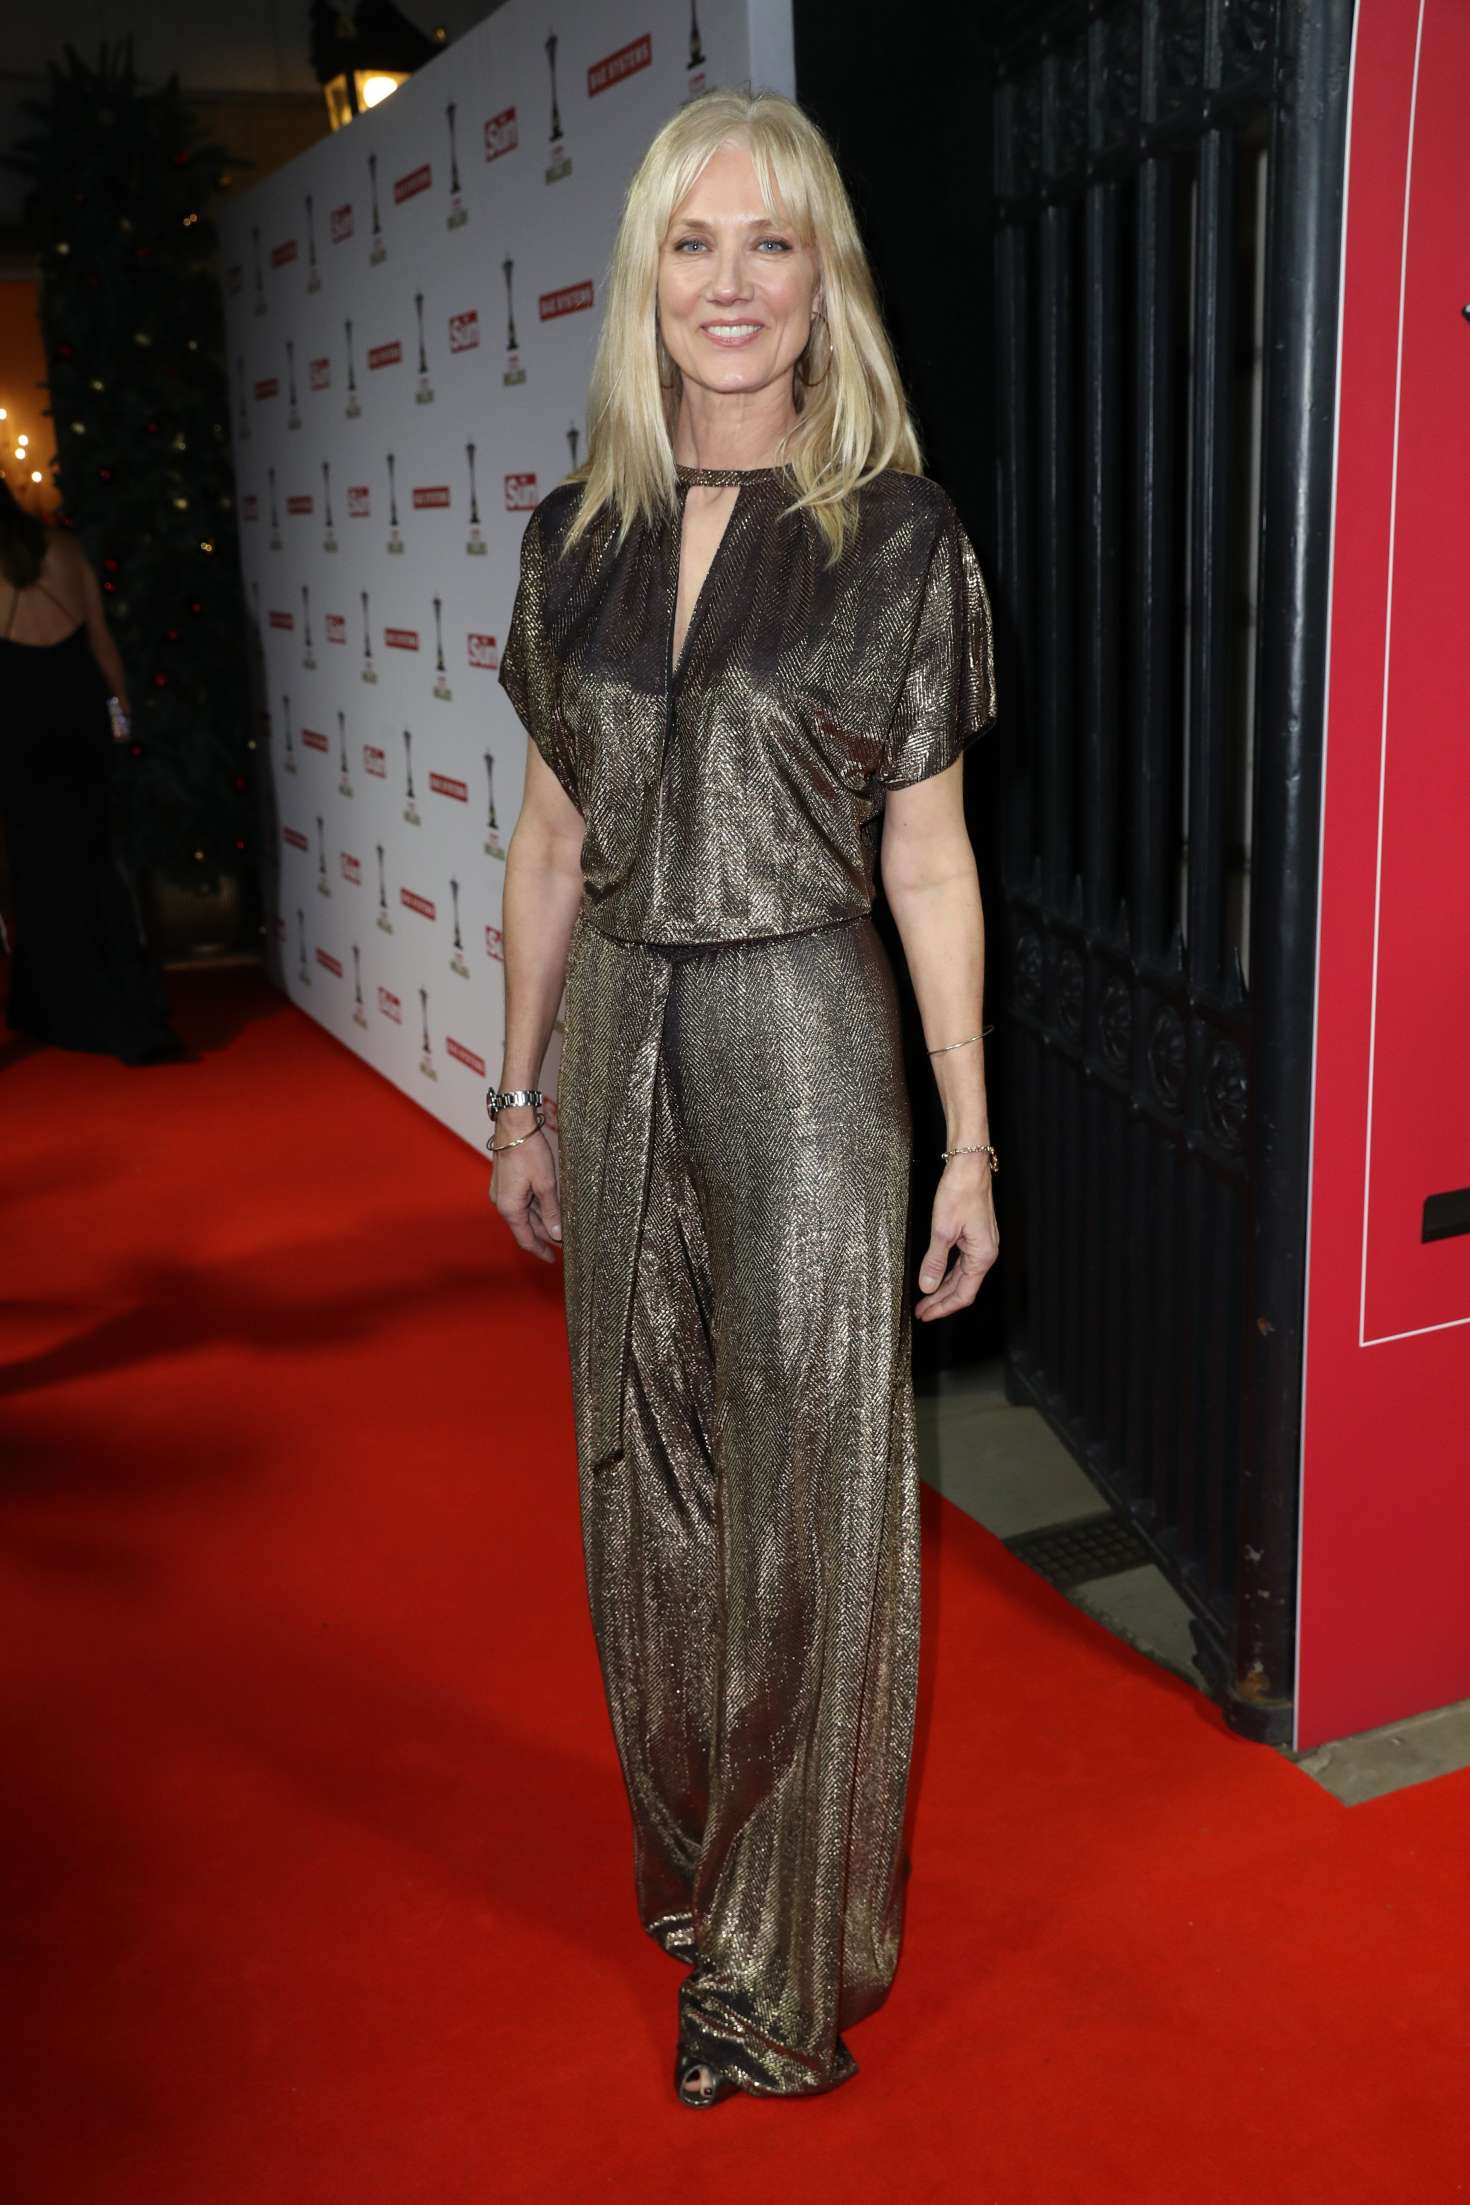 Joely Richardson - Sun Military Awards 2018 in London